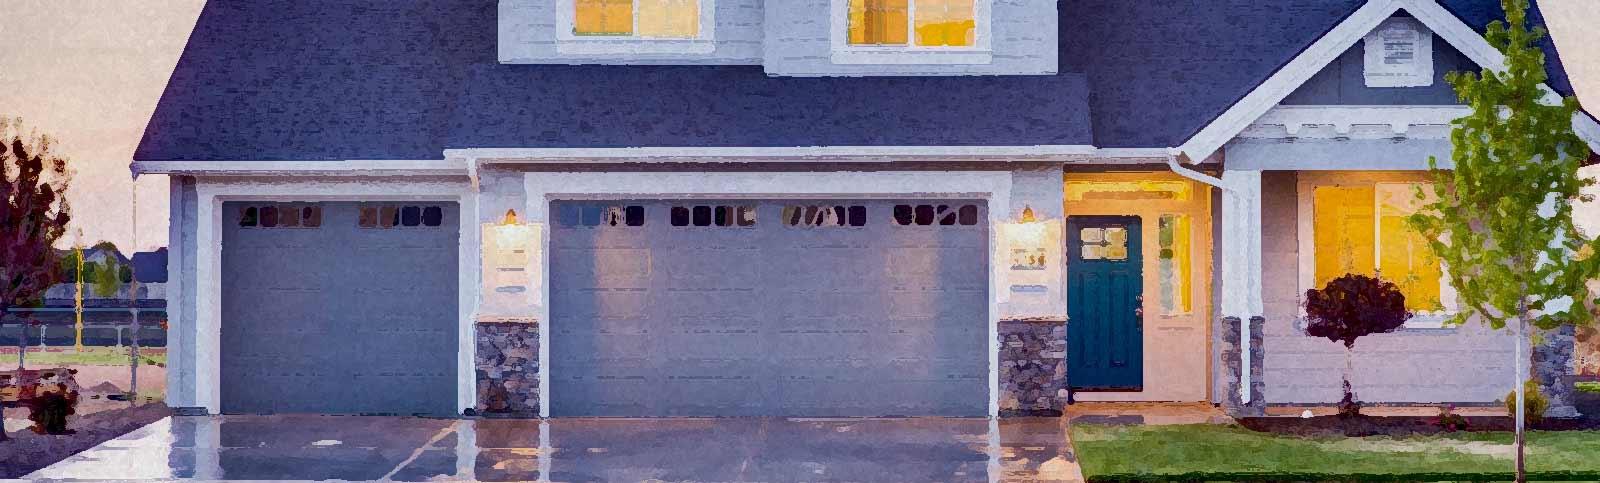 A Look at Some Surprising Benefits When Replacing Your Garage Door